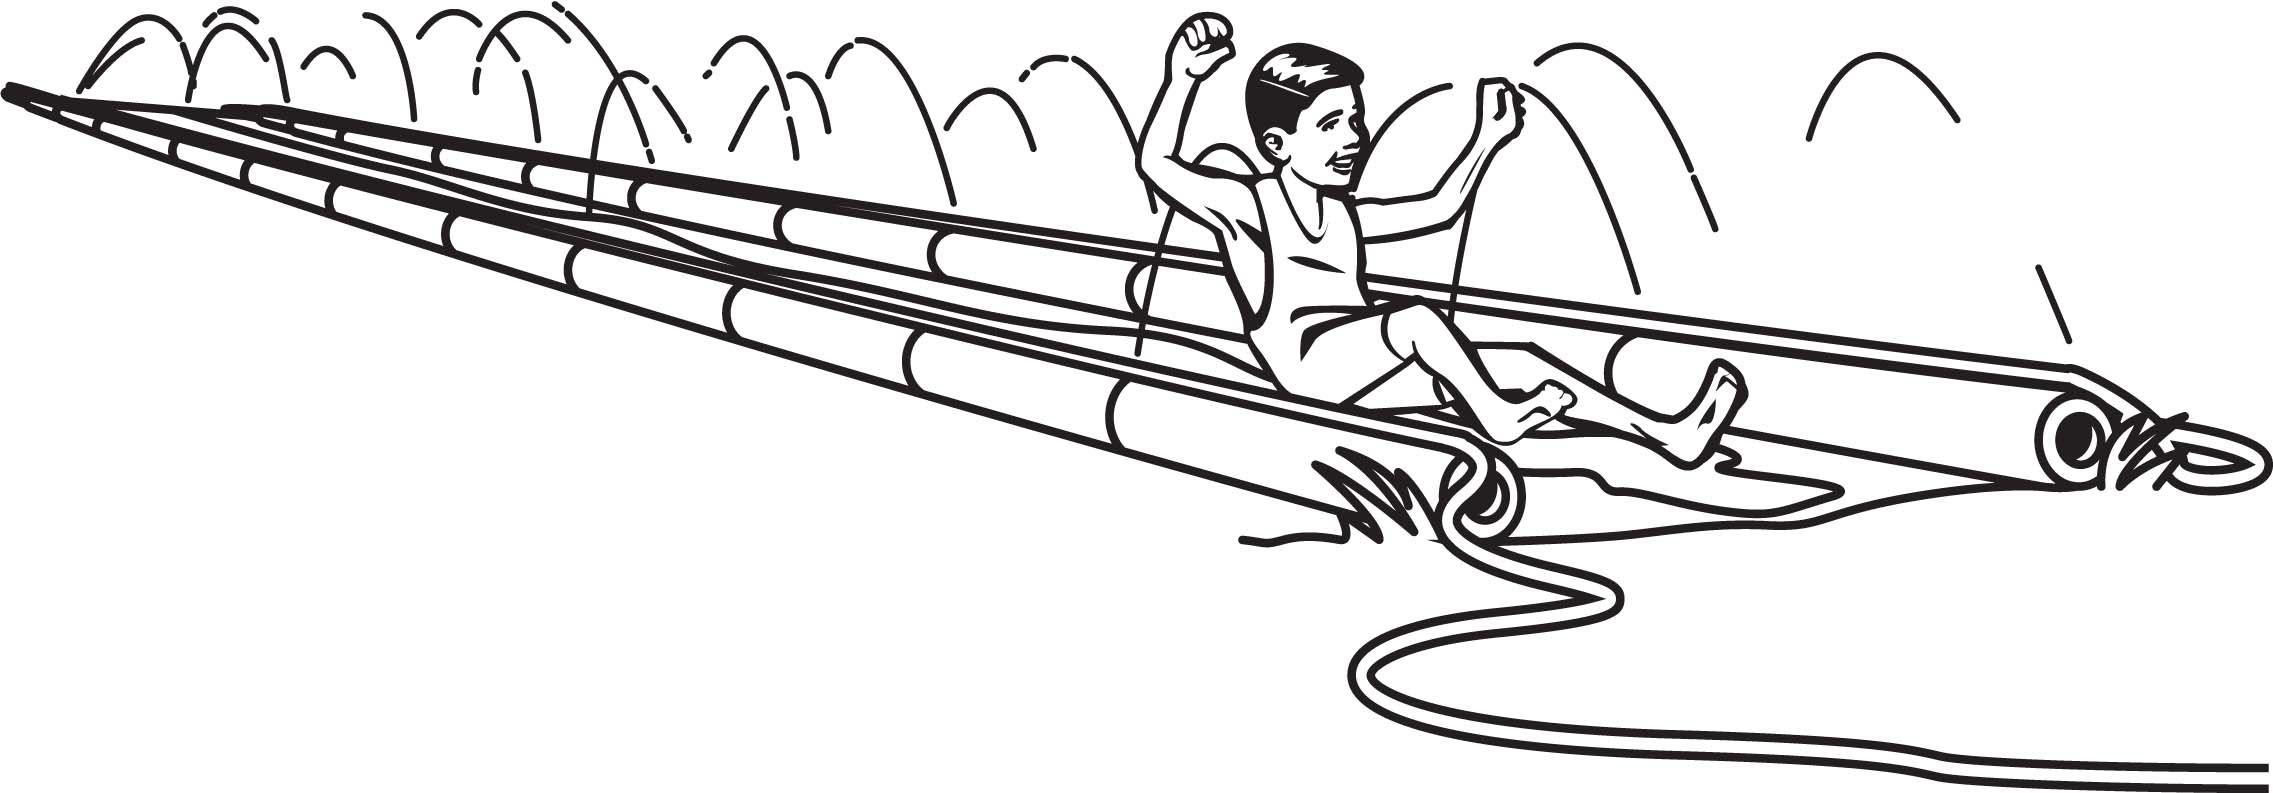 Build An Awesome Diy Slip N Slide For Summer Fun